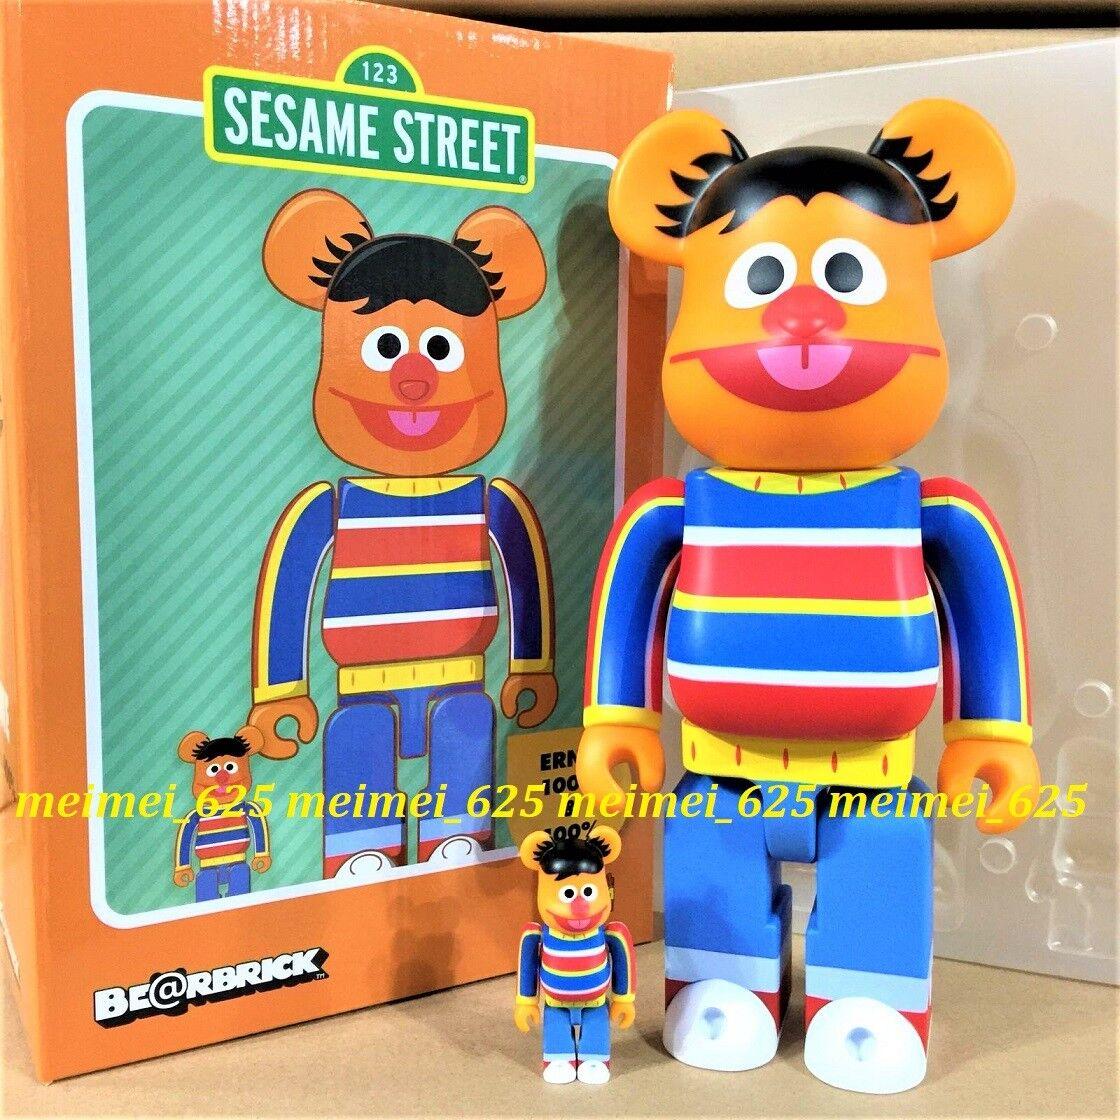 Bearbrick Medicom 2019 Sesame Street  Ernie 100% 400% conjunto Be@rbrick